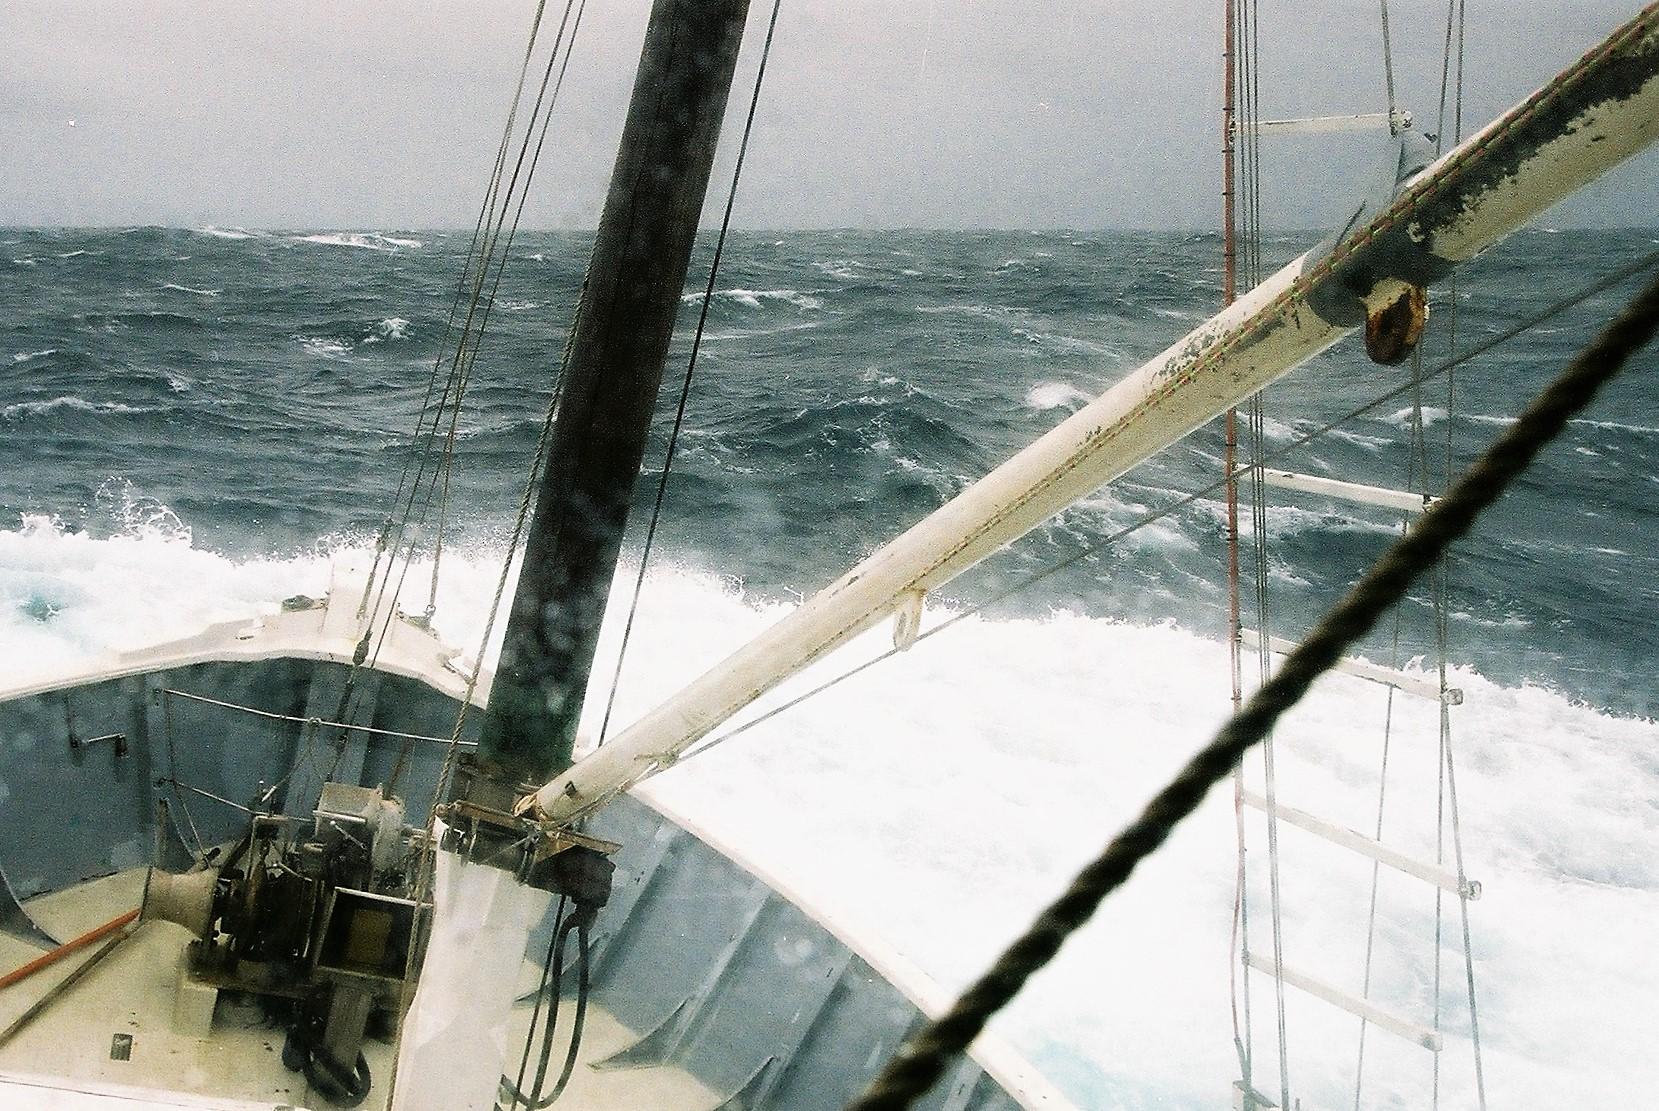 Southern Ocean gale